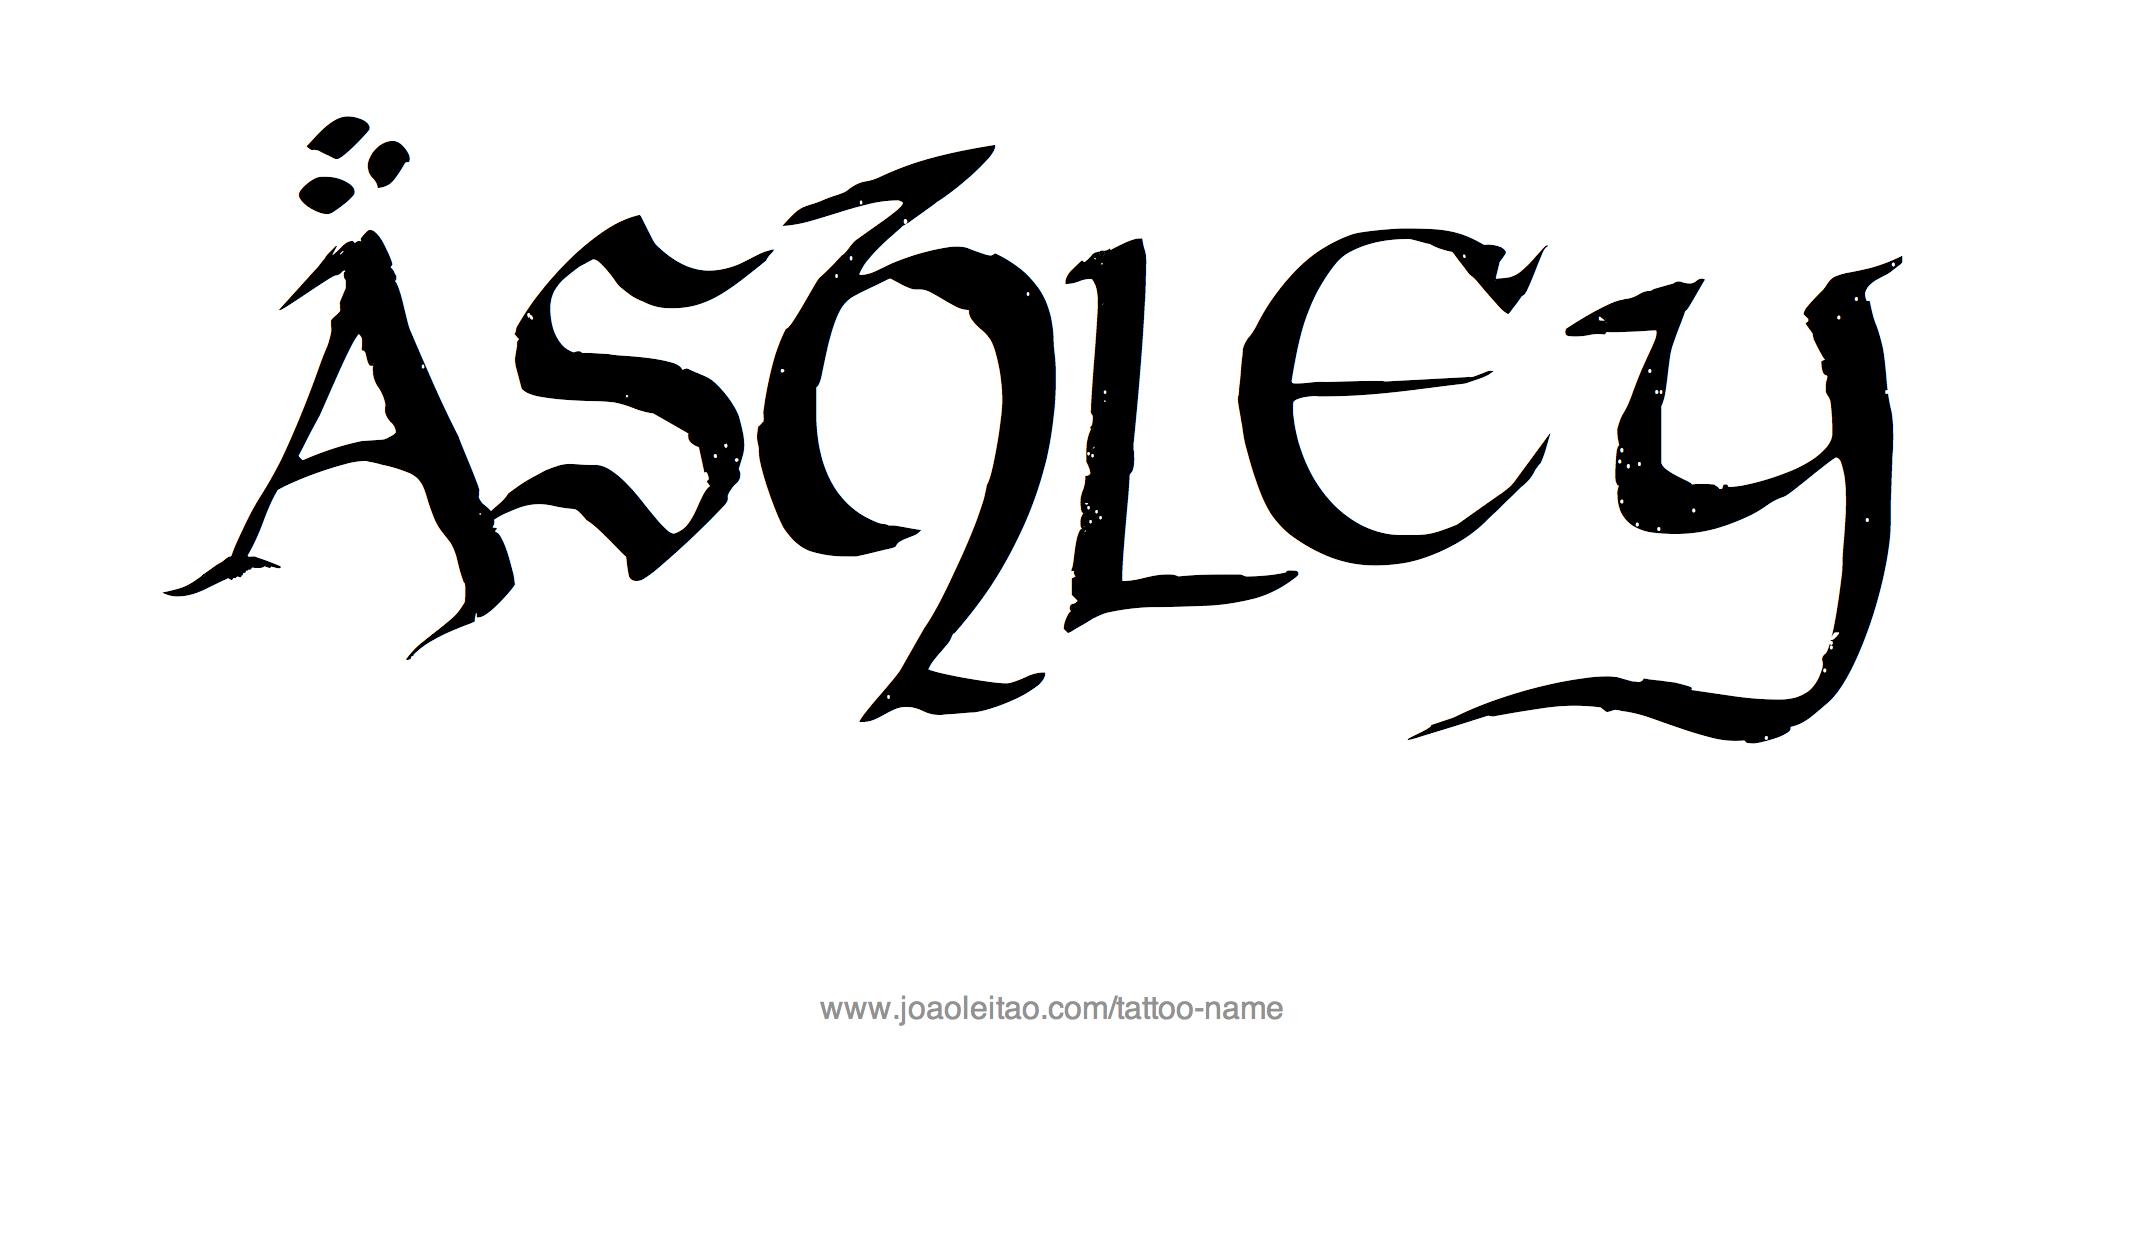 cursive tattoo name ashley rachael edwards. Black Bedroom Furniture Sets. Home Design Ideas